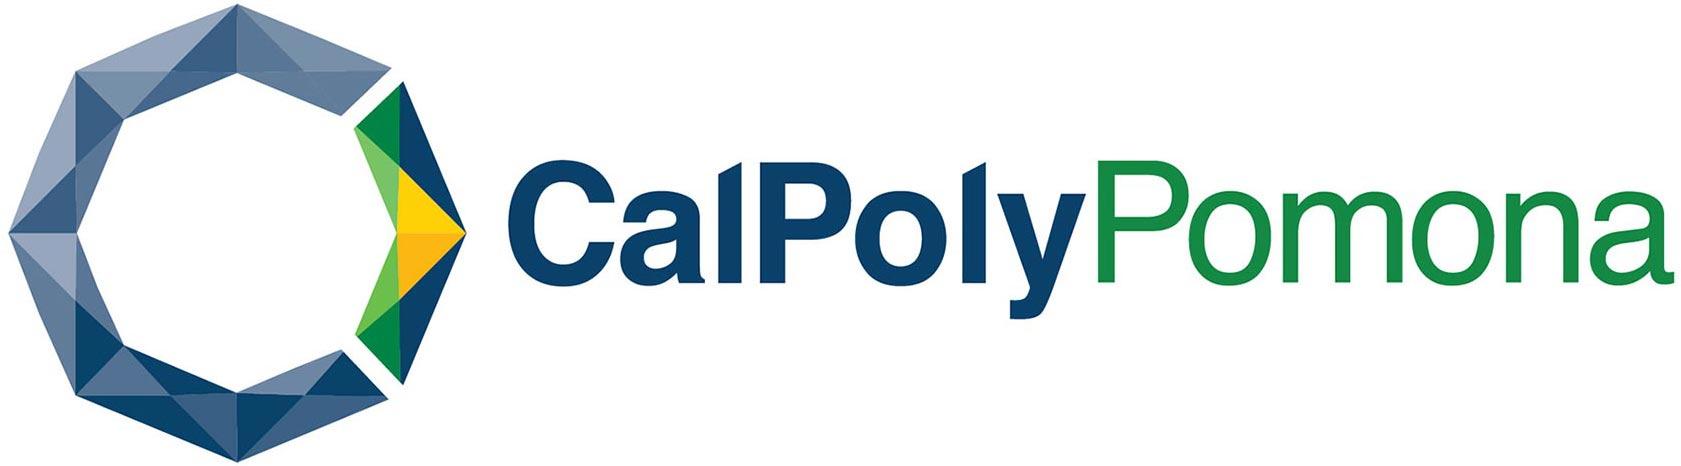 The new Cal Poly Pomona logo.